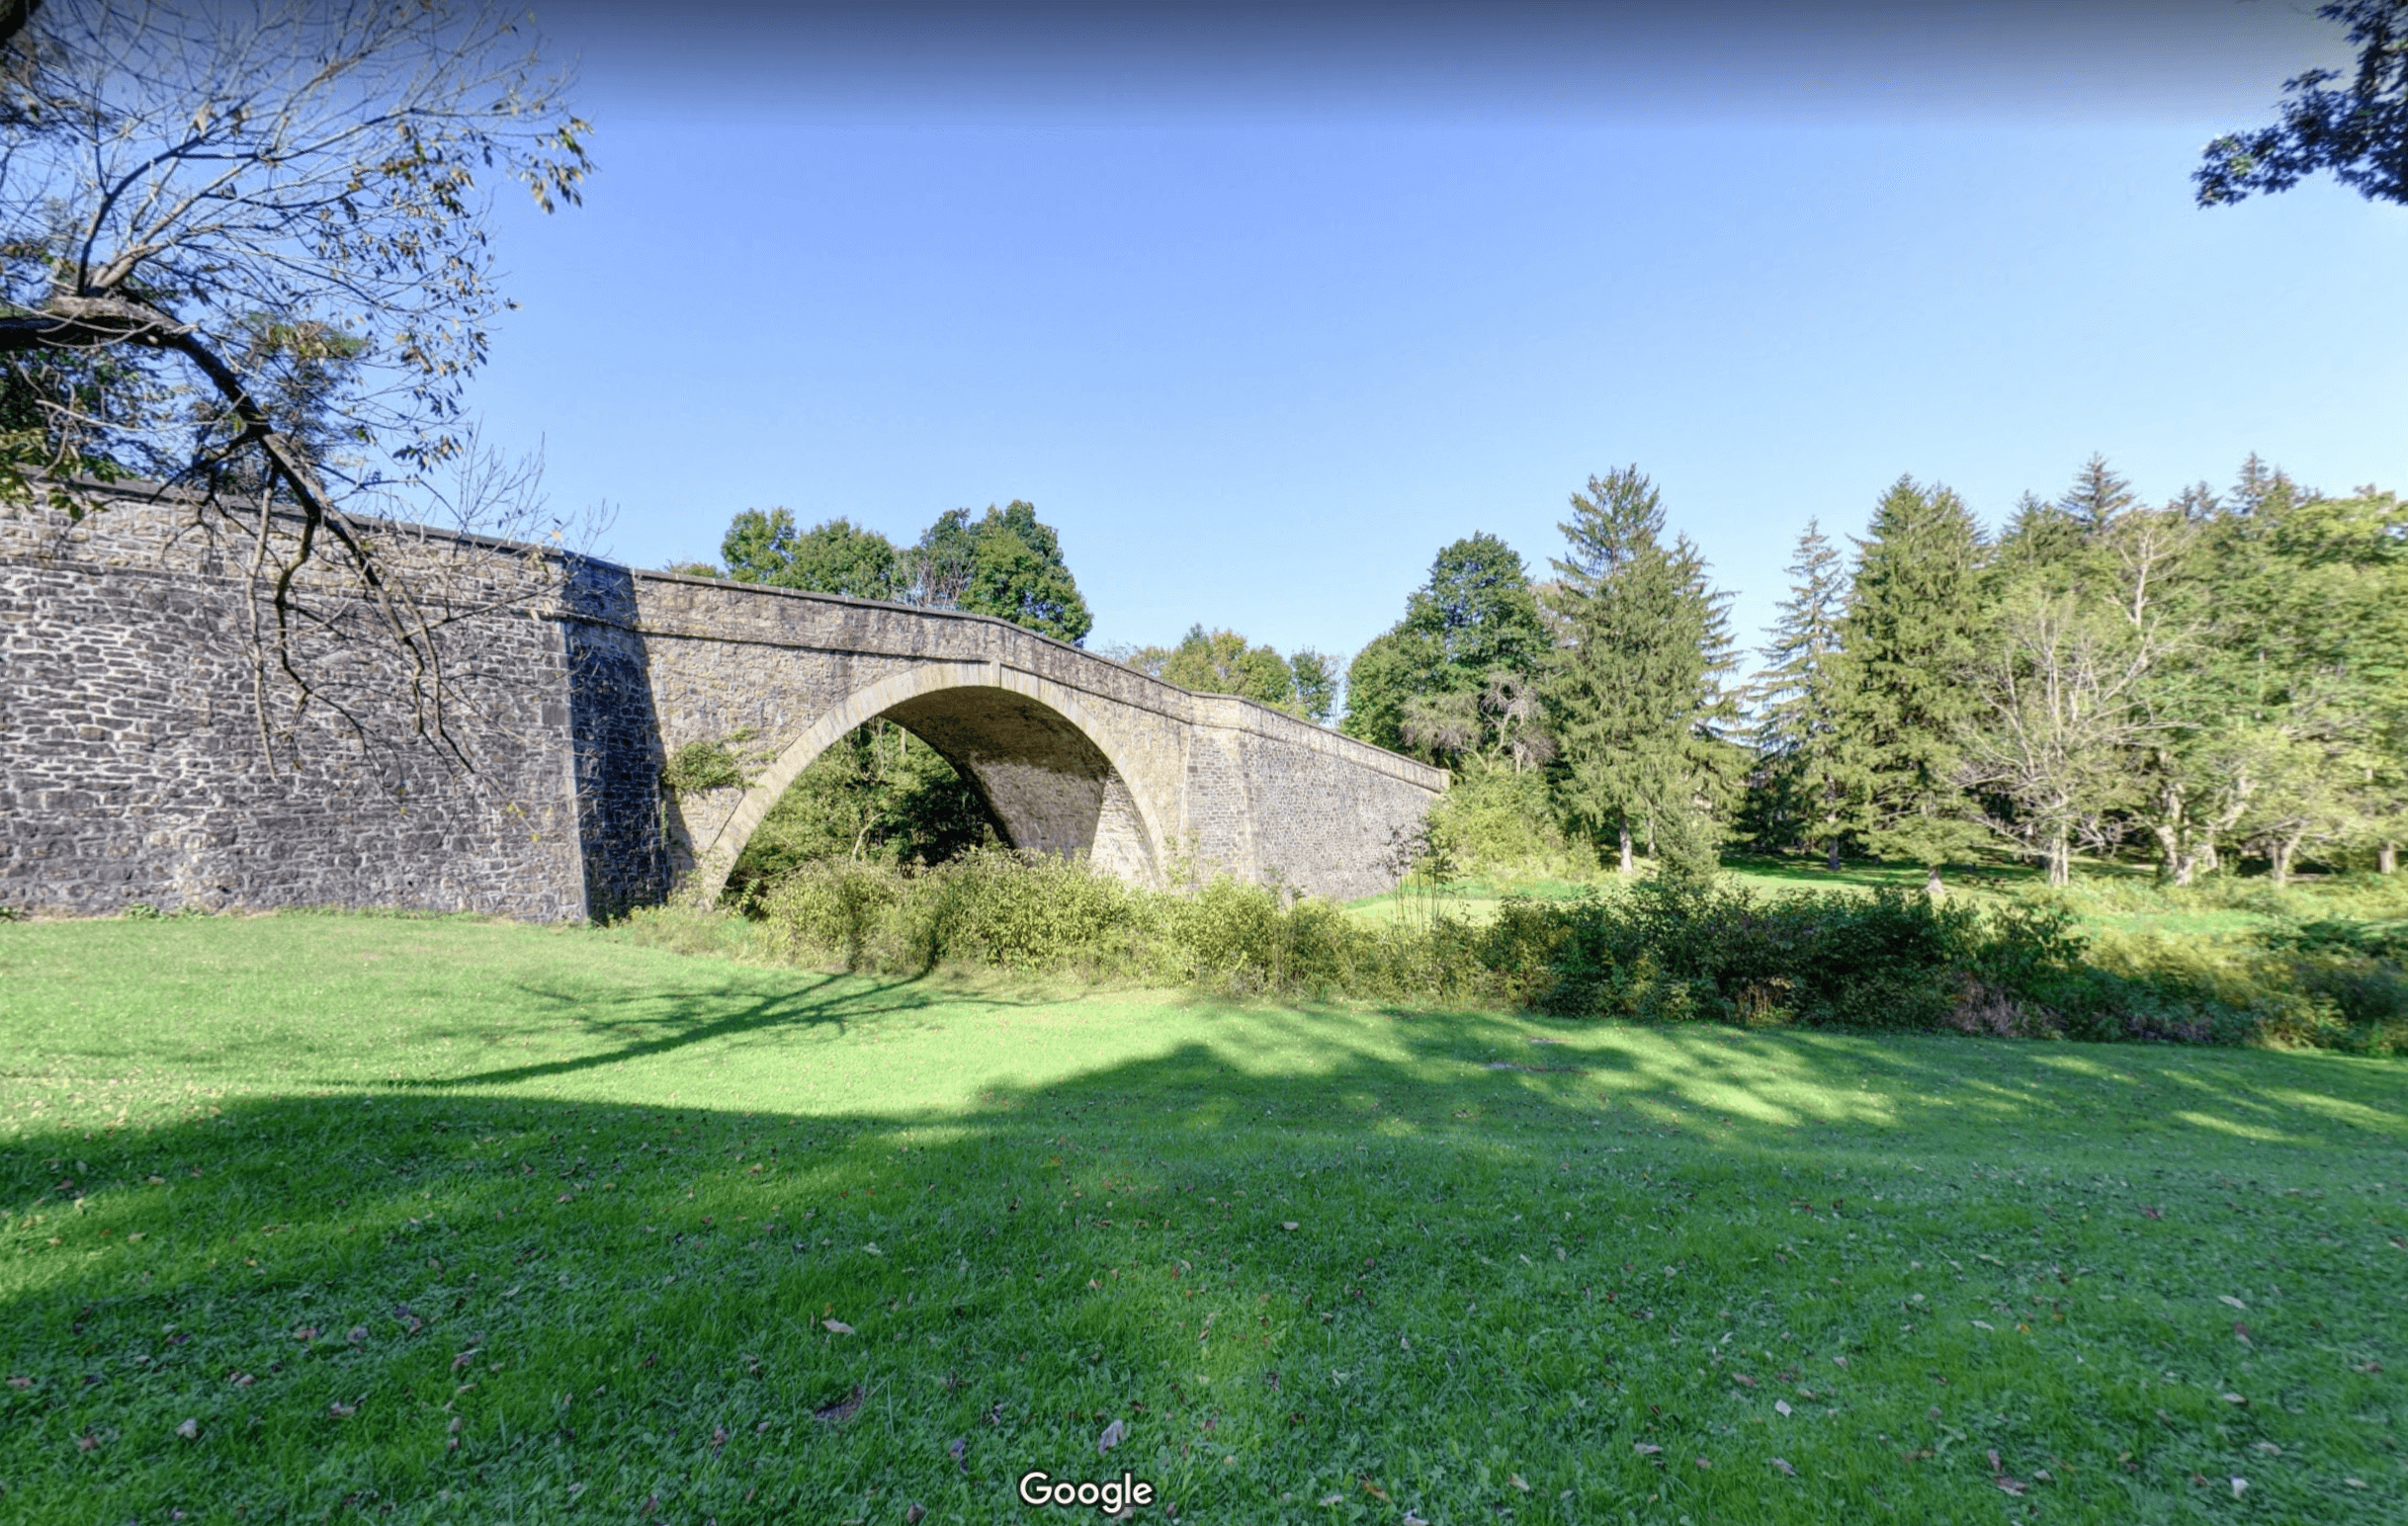 80-foot Span Stone Bridge in Grantsville, MD